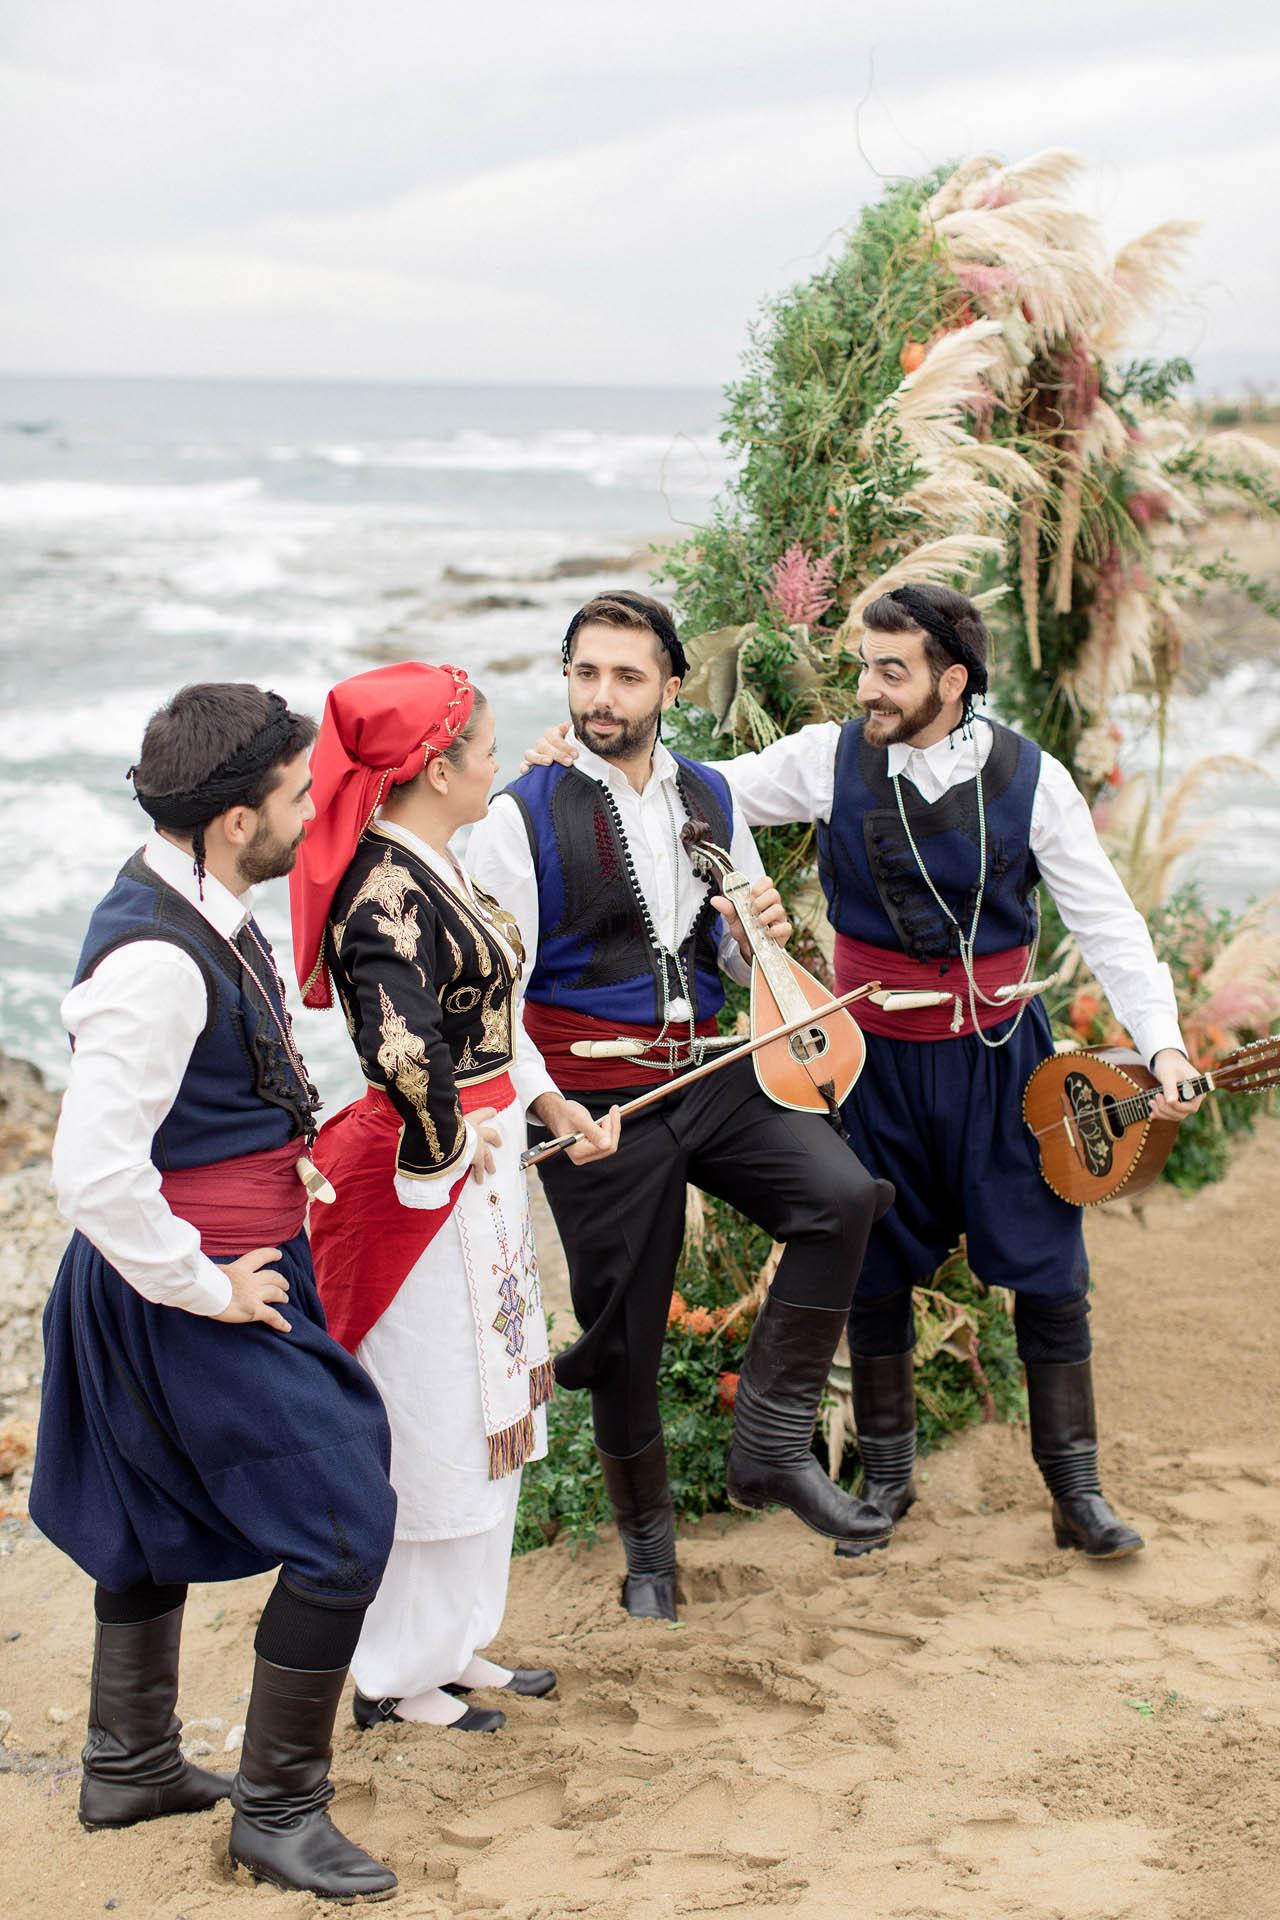 Greek entertINMENT